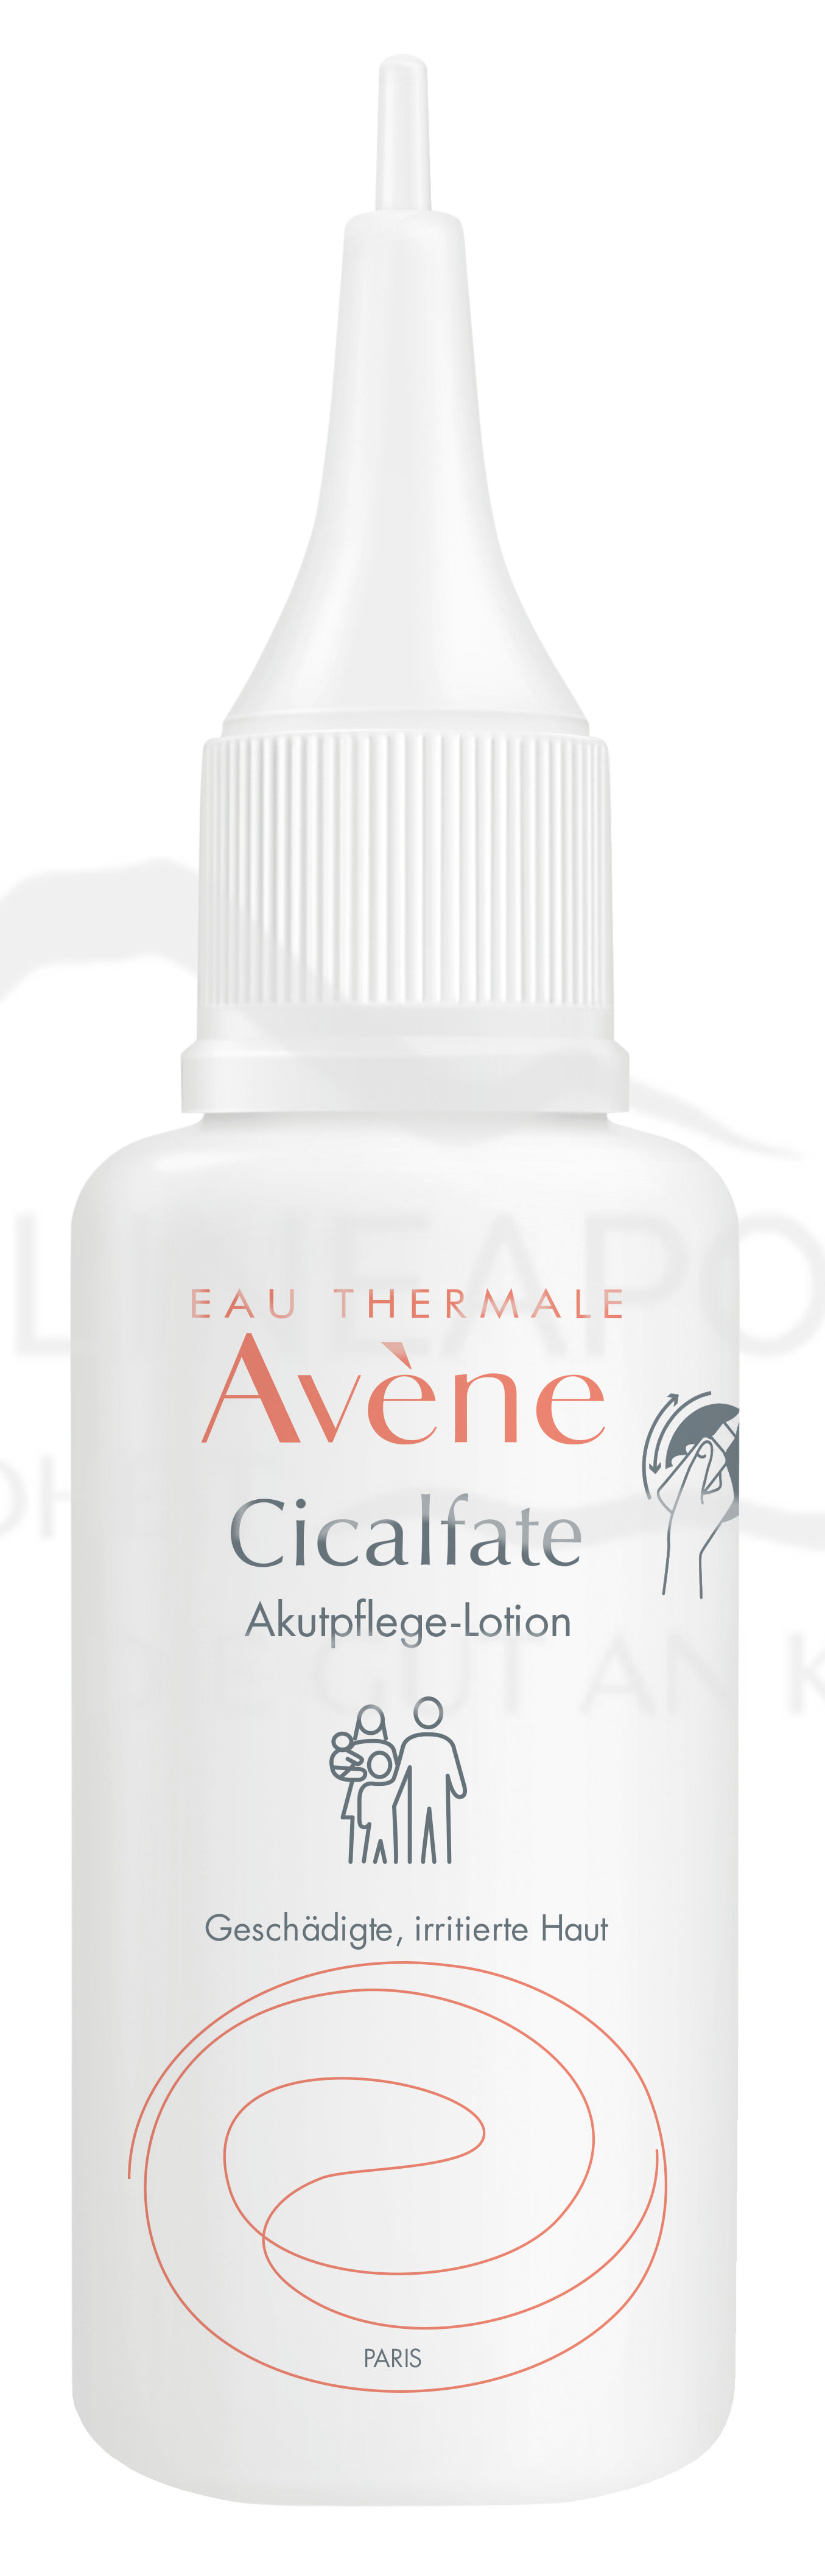 Avène Cicalfate Akutpflege-Lotion